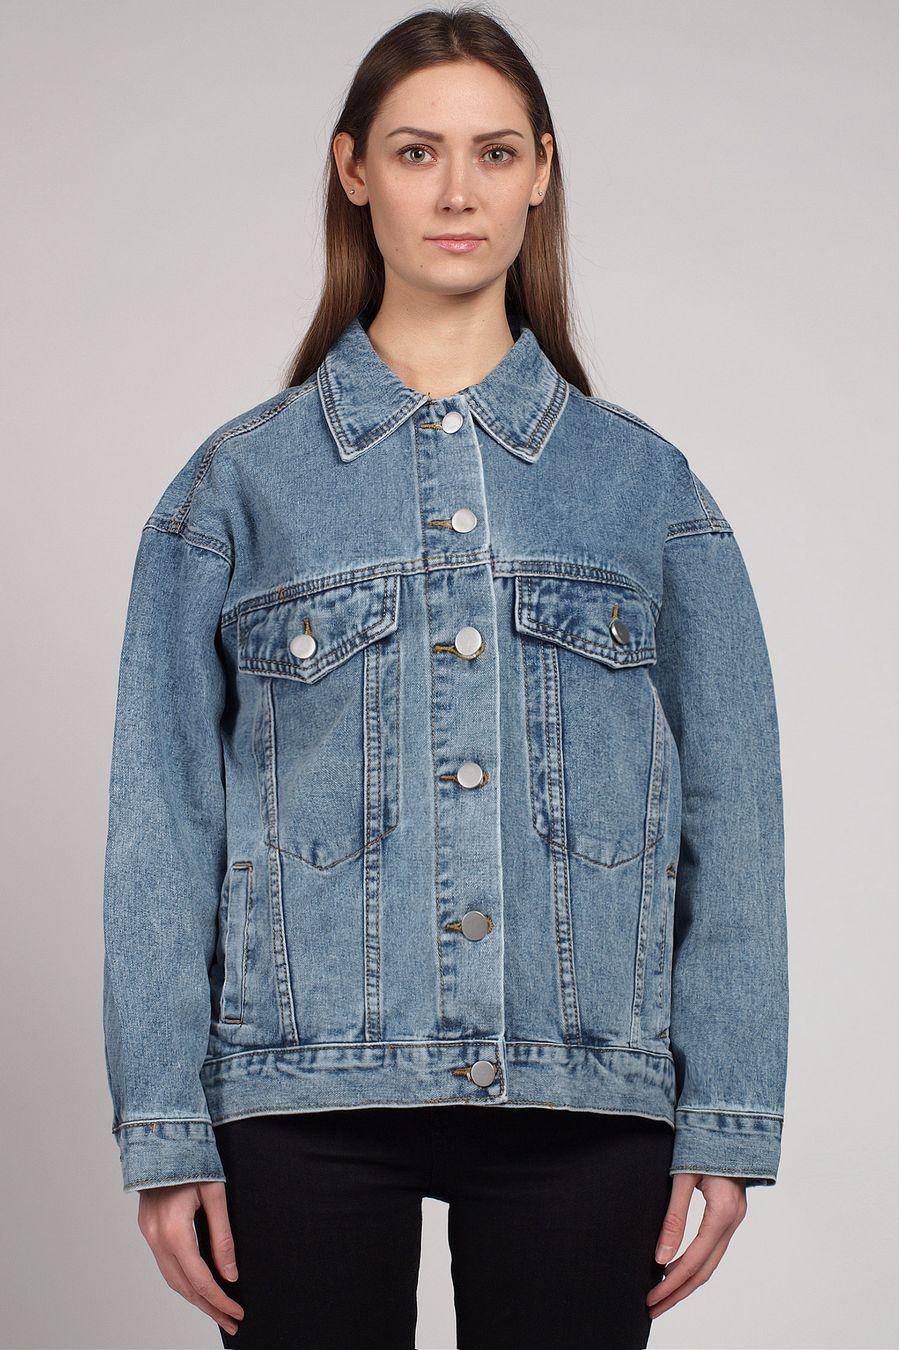 Жакет женский (джинсовка) LRZBS 2026 - фото 2